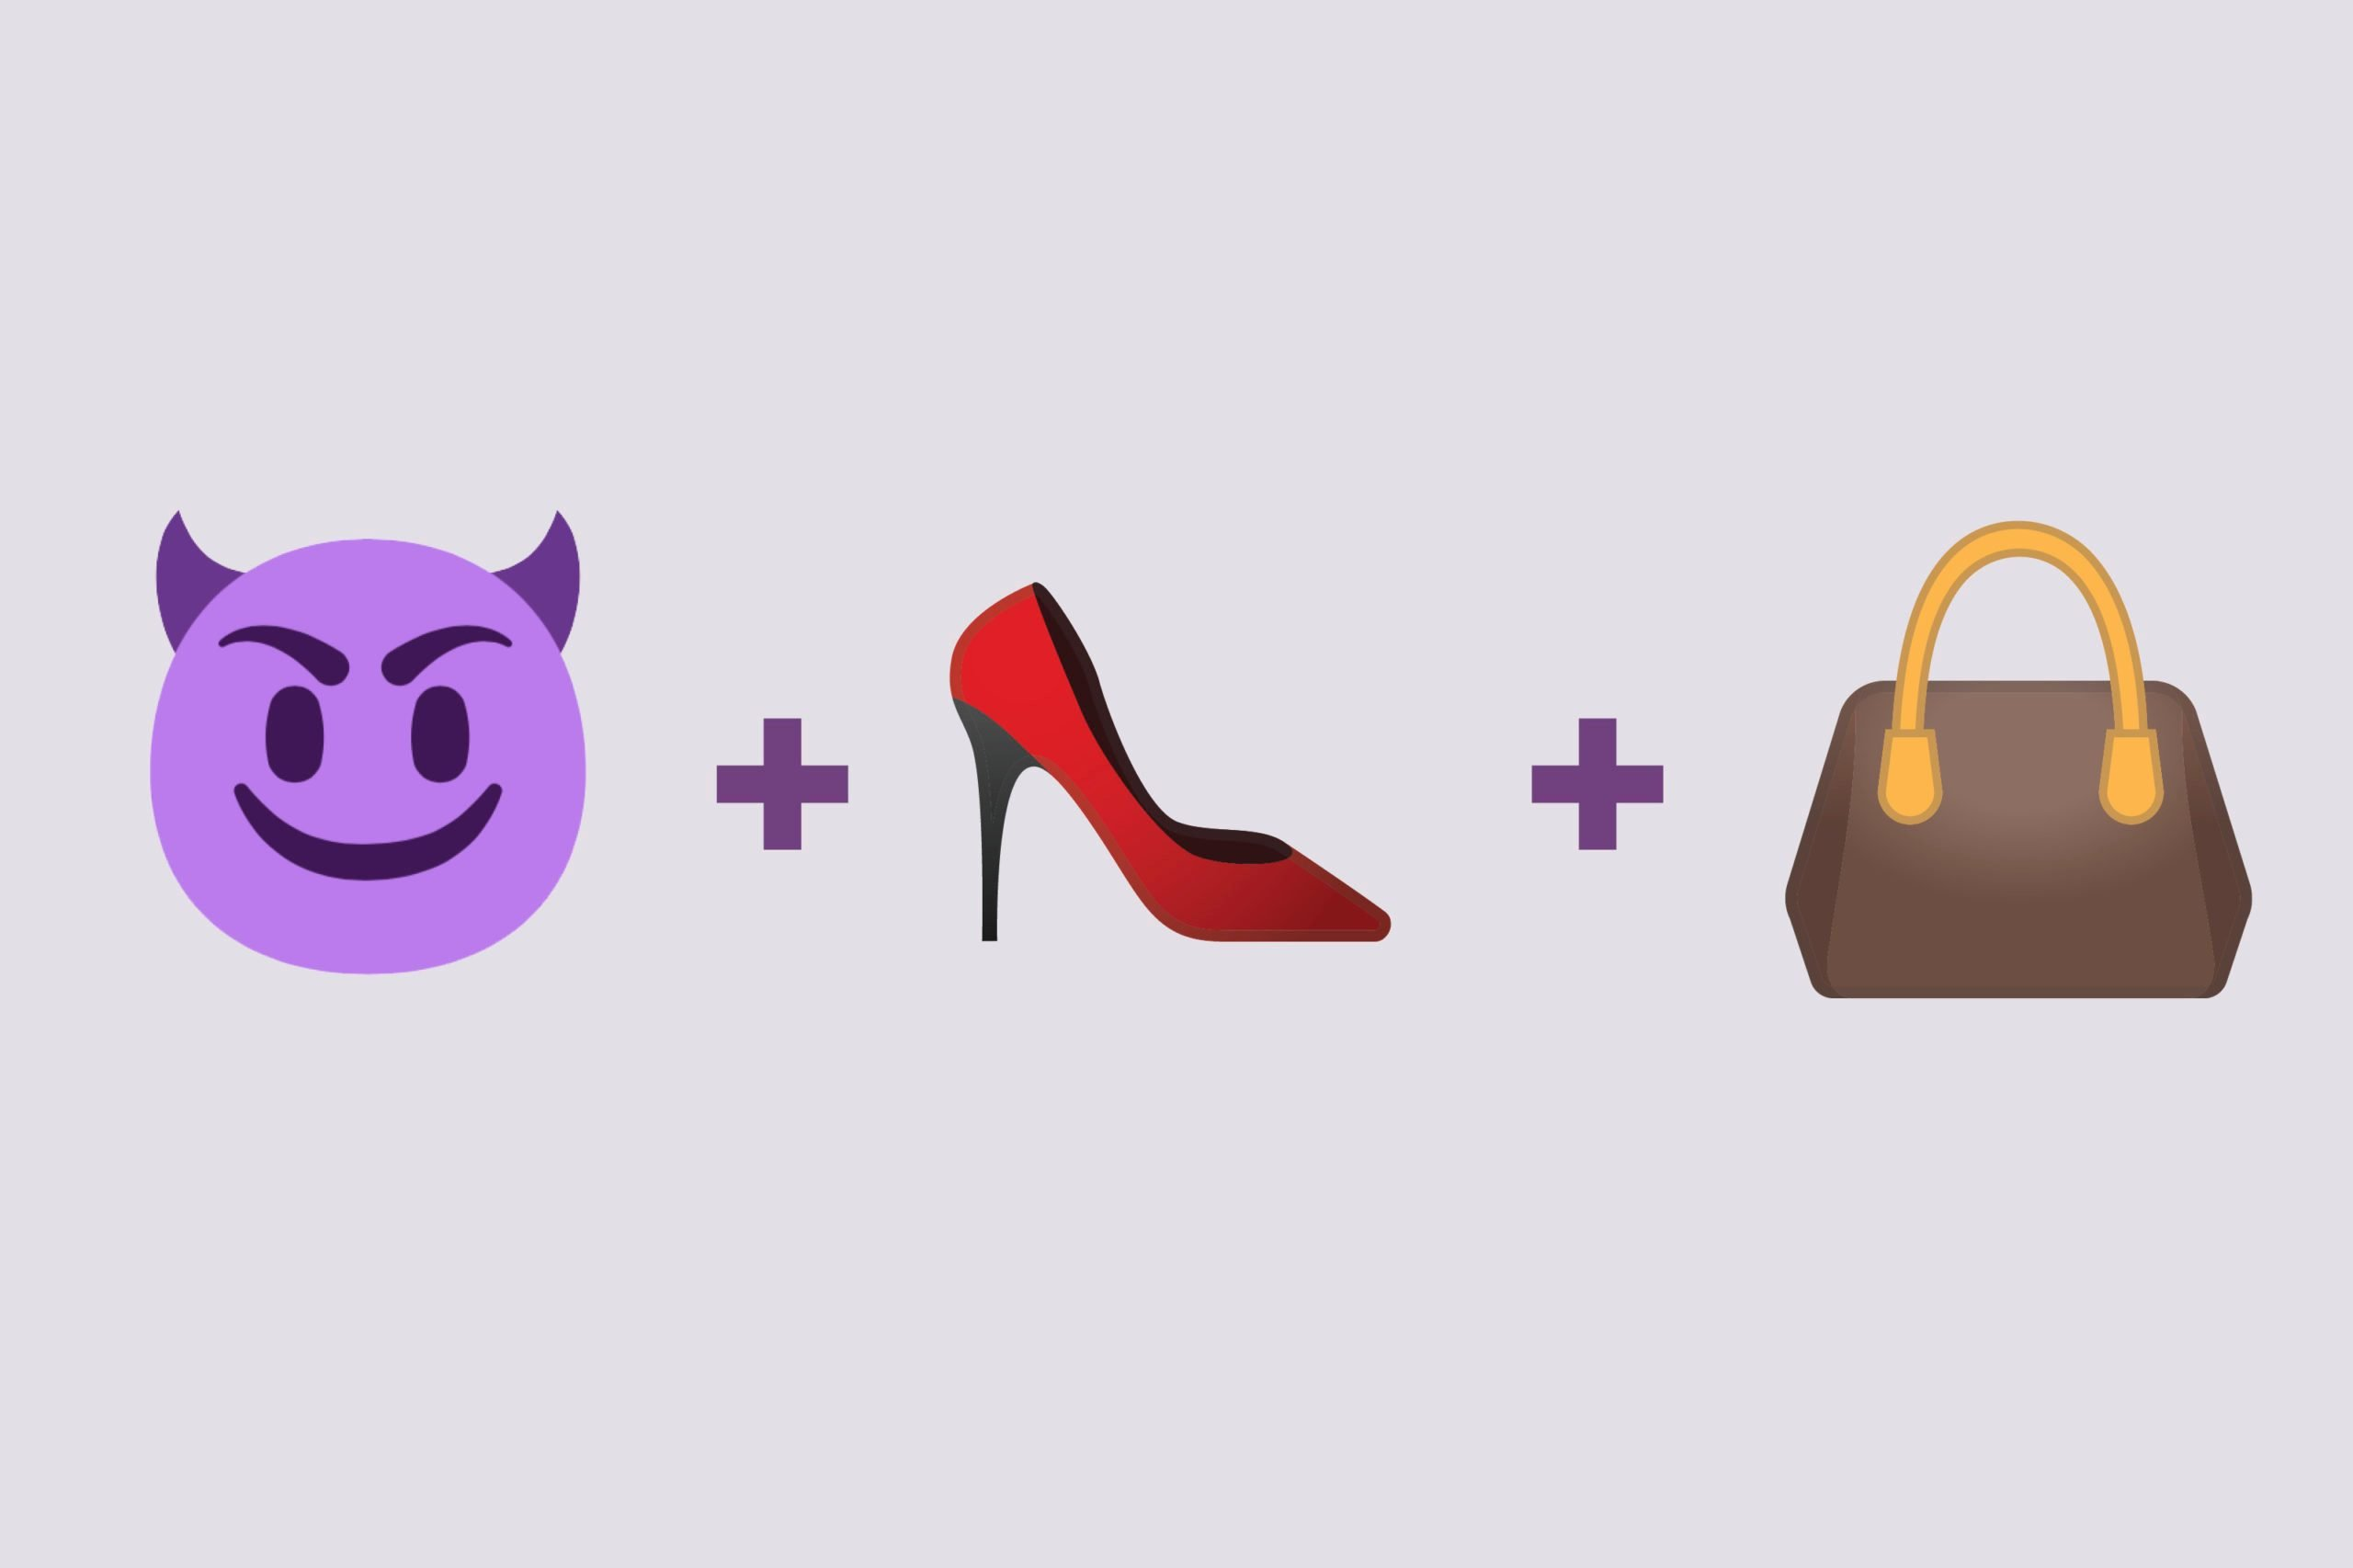 Devil emoji + high heel emoji + handbag emoji